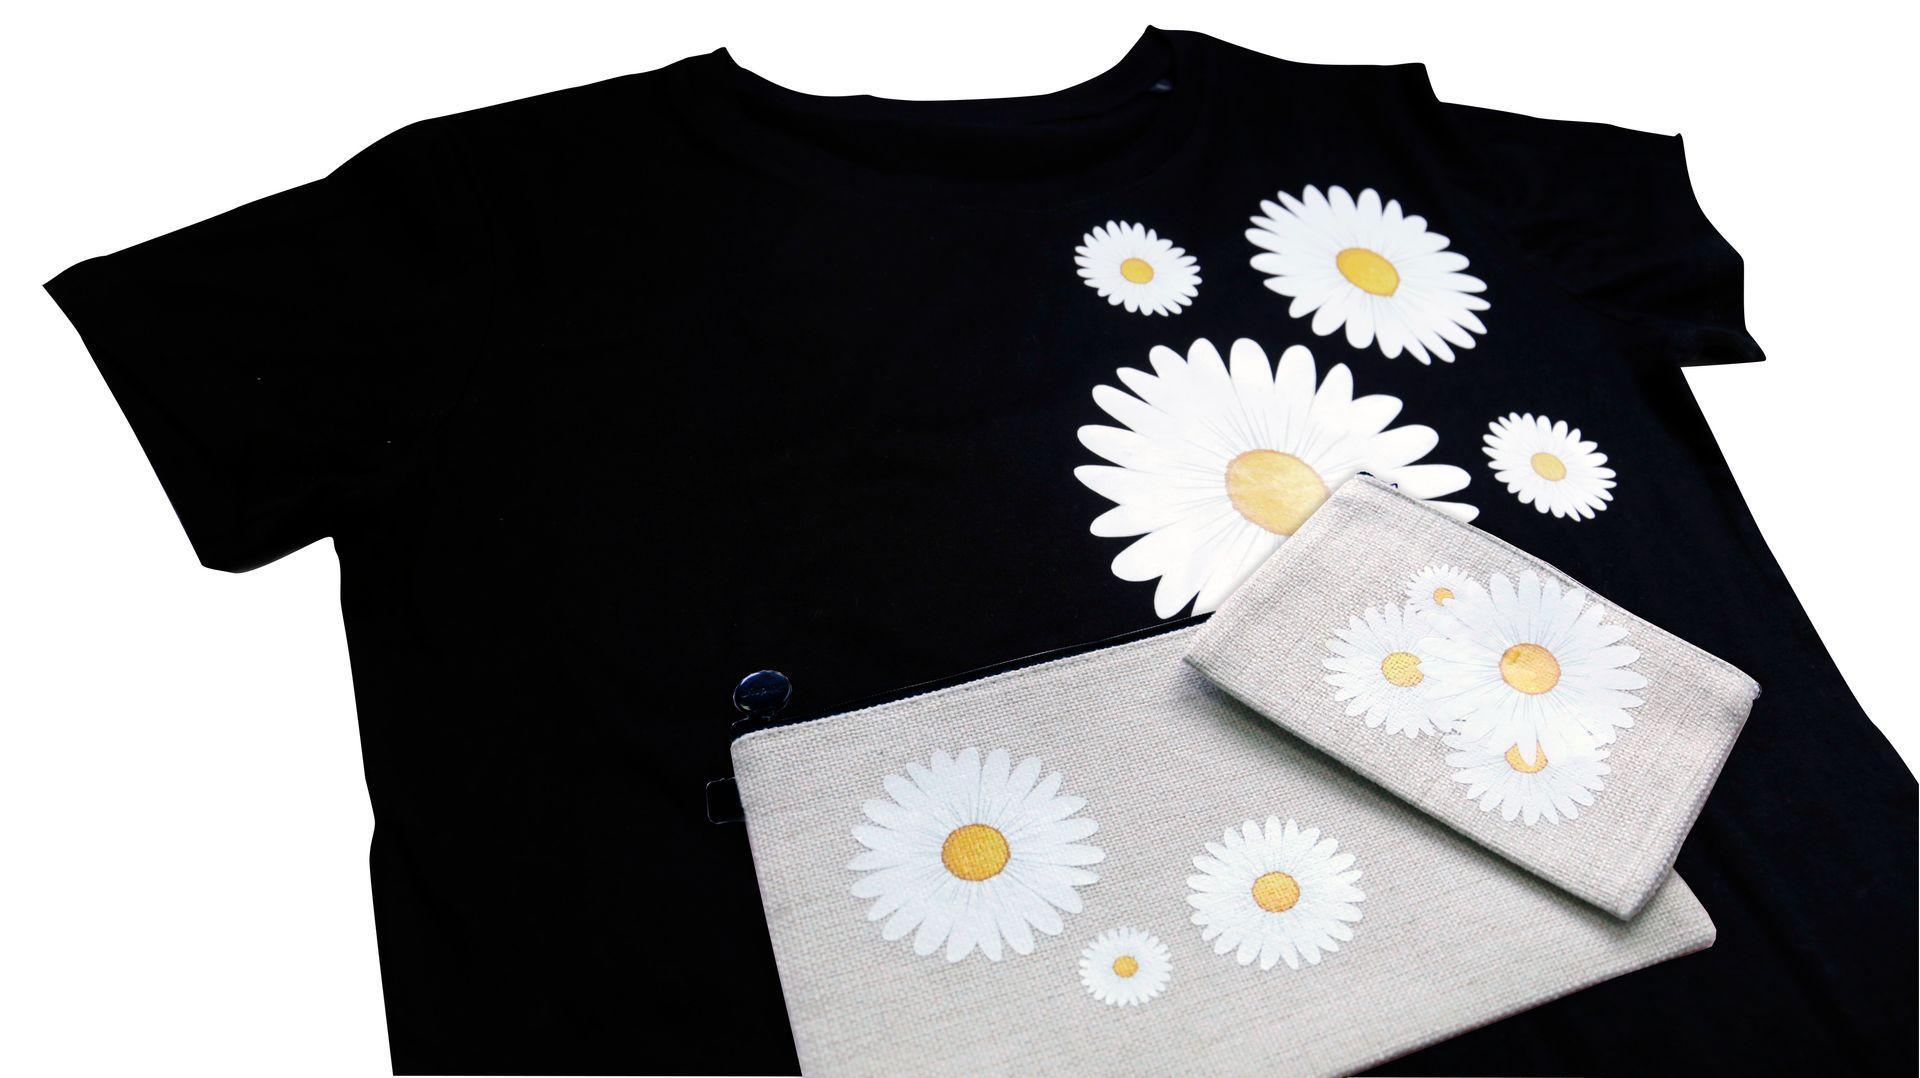 <p>Najbolja i najbelja printabilna termo transfer folija za tekstil na tržištu!</p>